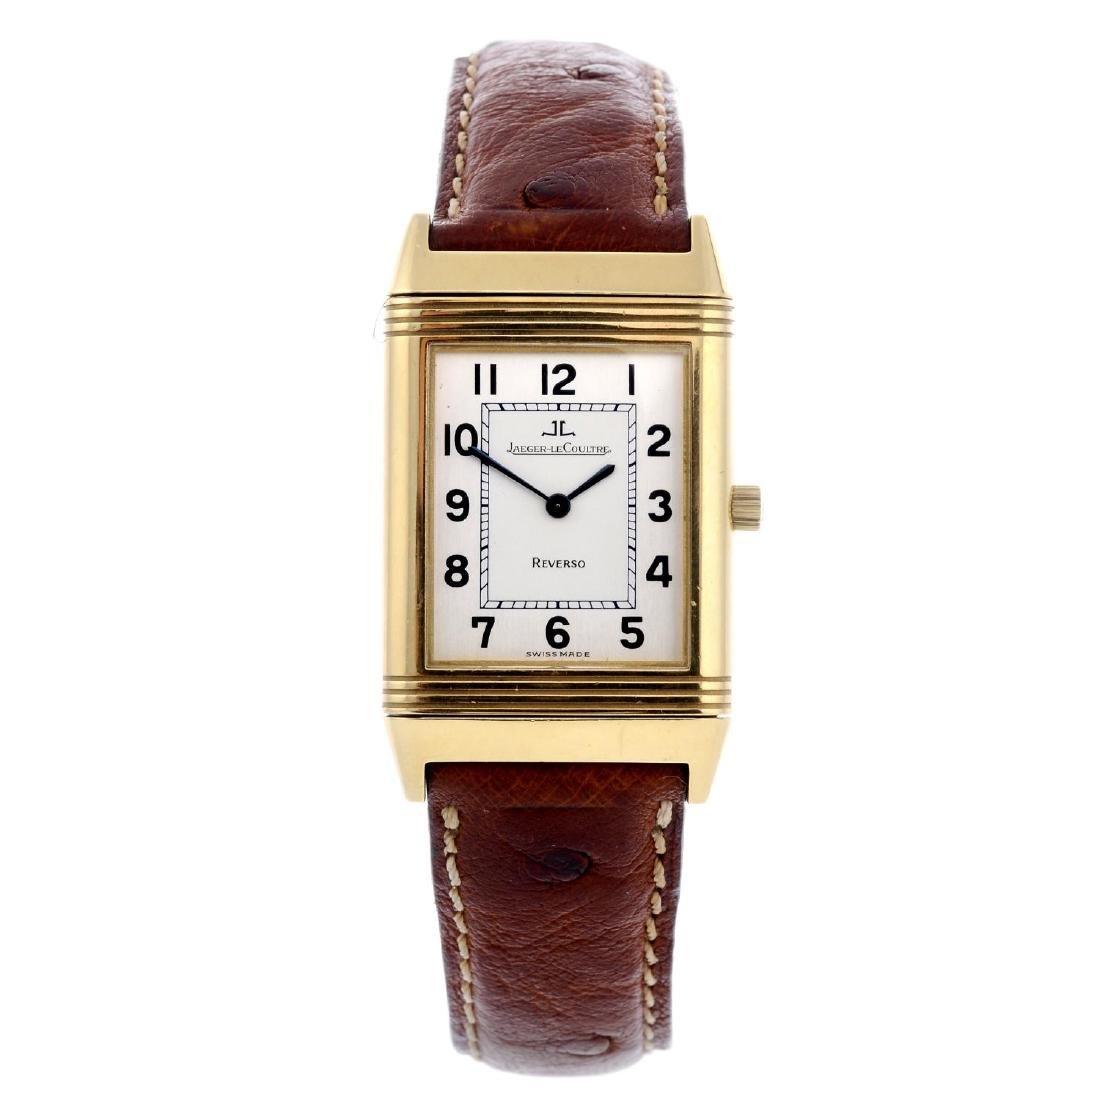 JAEGER-LECOULTRE - a Reverso wrist watch. Yellow metal